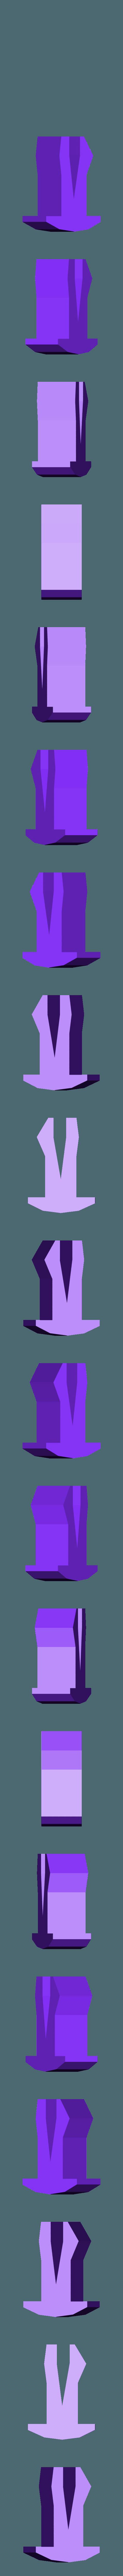 Part3_pin_MasterSpoolPlexiwire100Meters.stl Download free STL file Little Master Spool remix for Plexiwire 100 meters • 3D printer model, Az3Dip